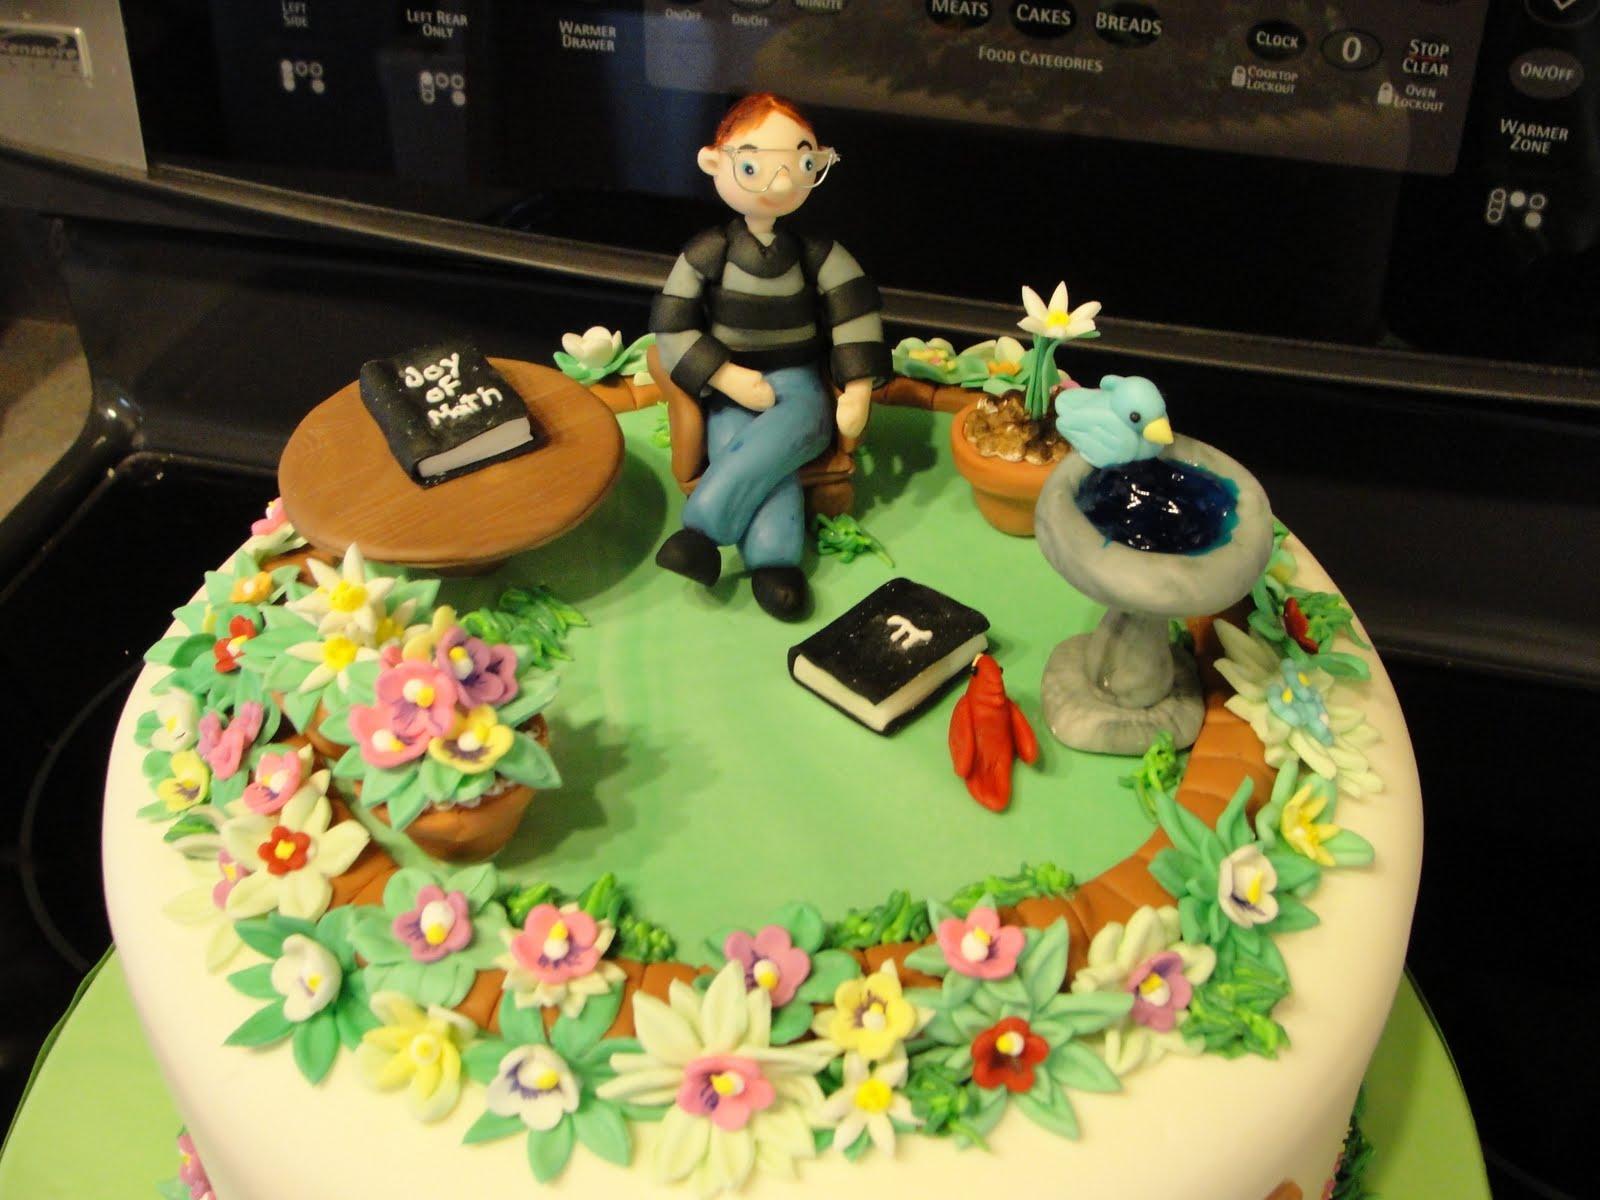 Oh, just put a cupcake in it....: Gardener/Math Teacher